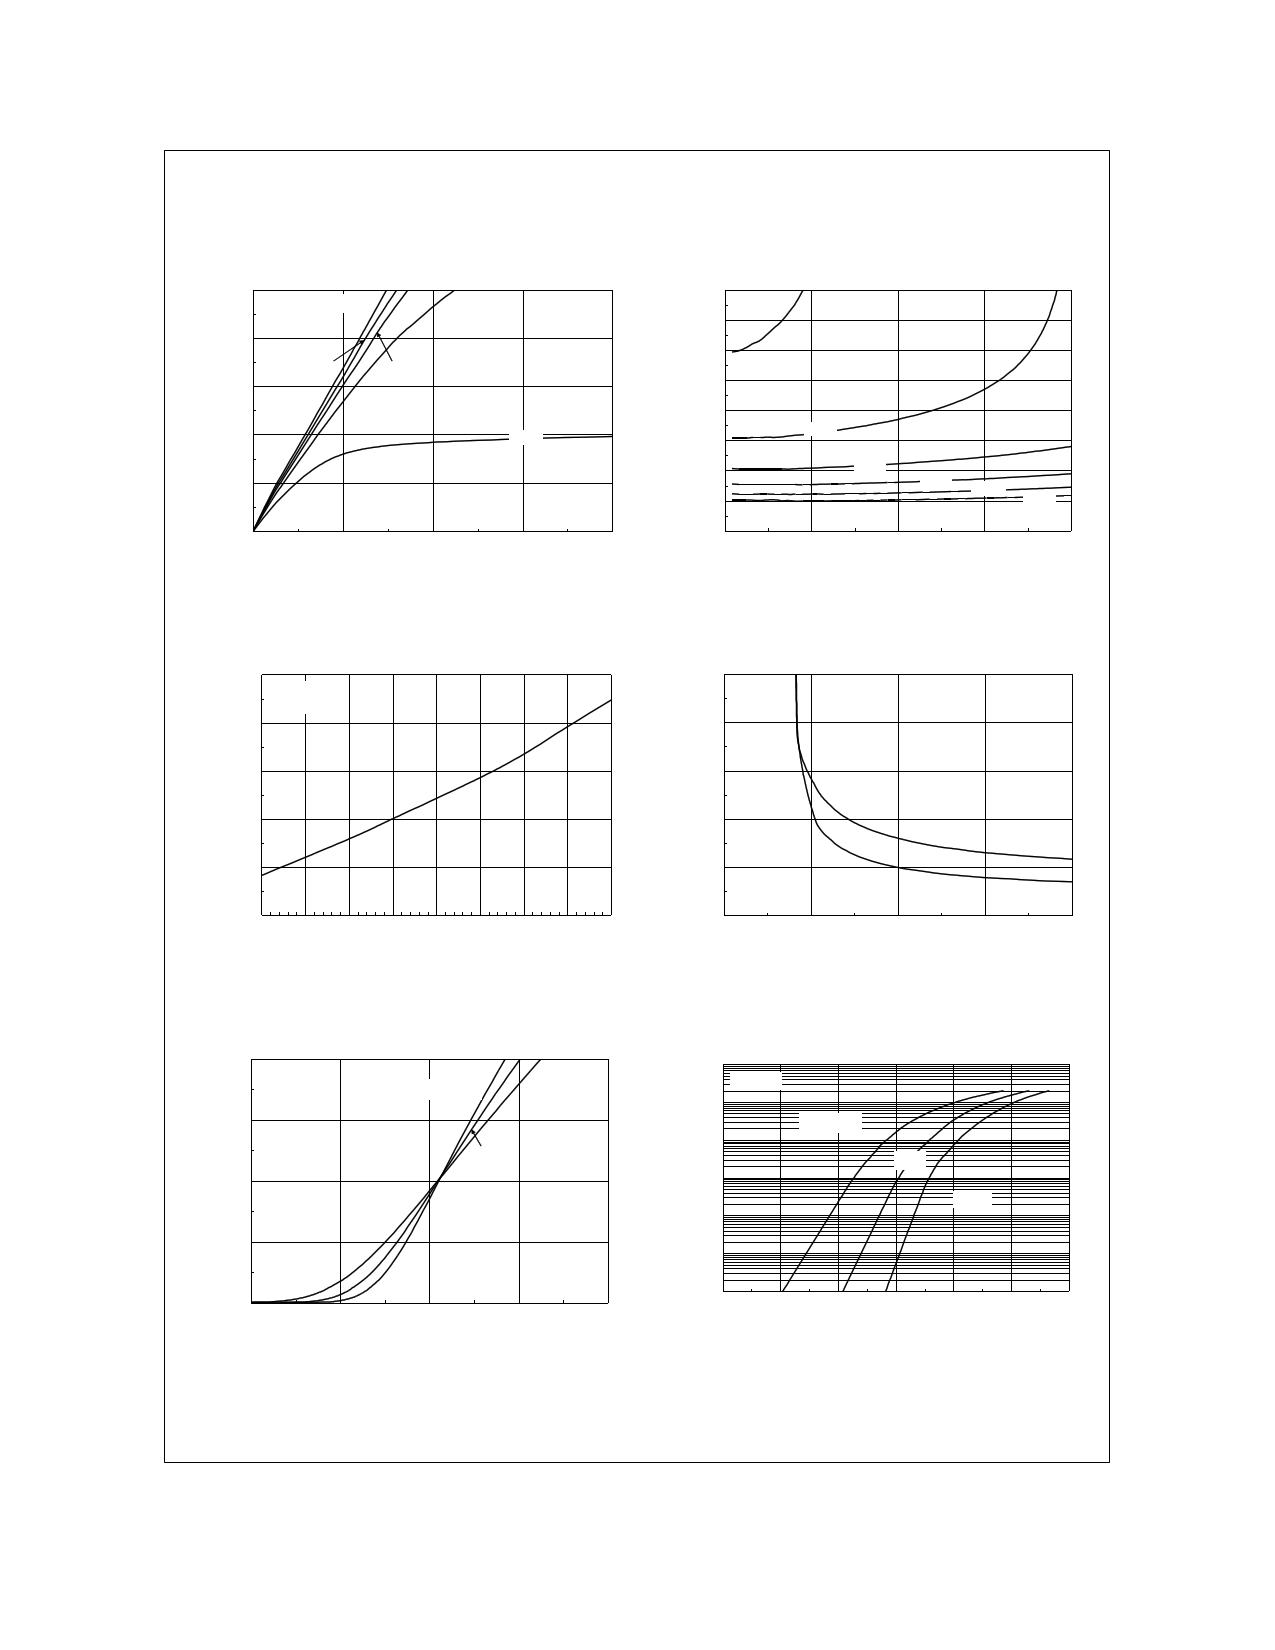 FDS9934C pdf, 반도체, 판매, 대치품